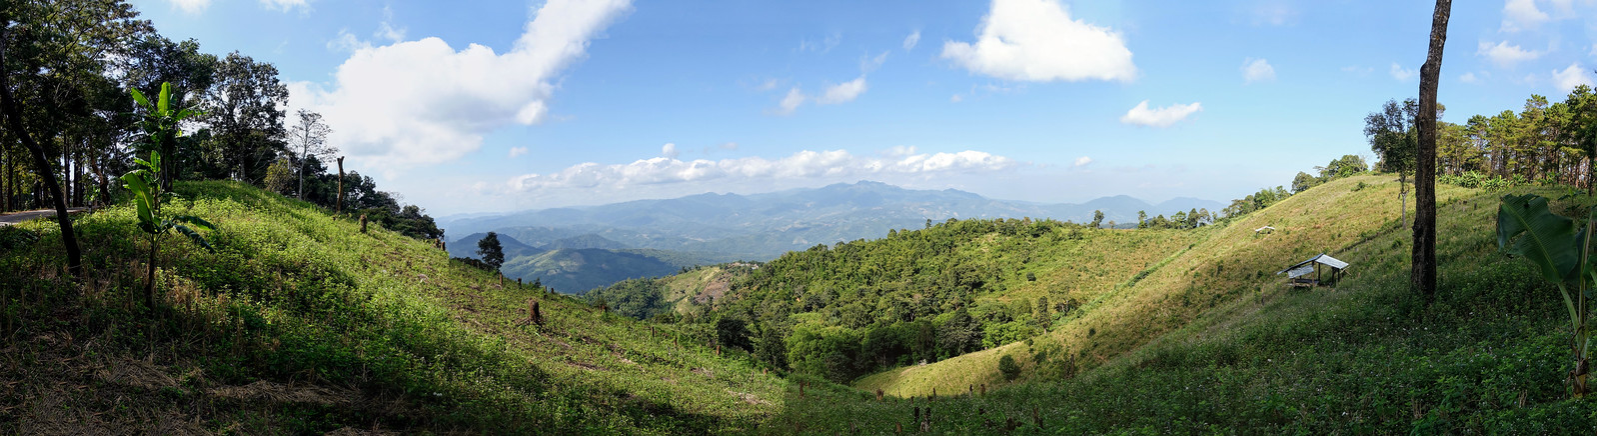 Myanmar Mountain Countryside